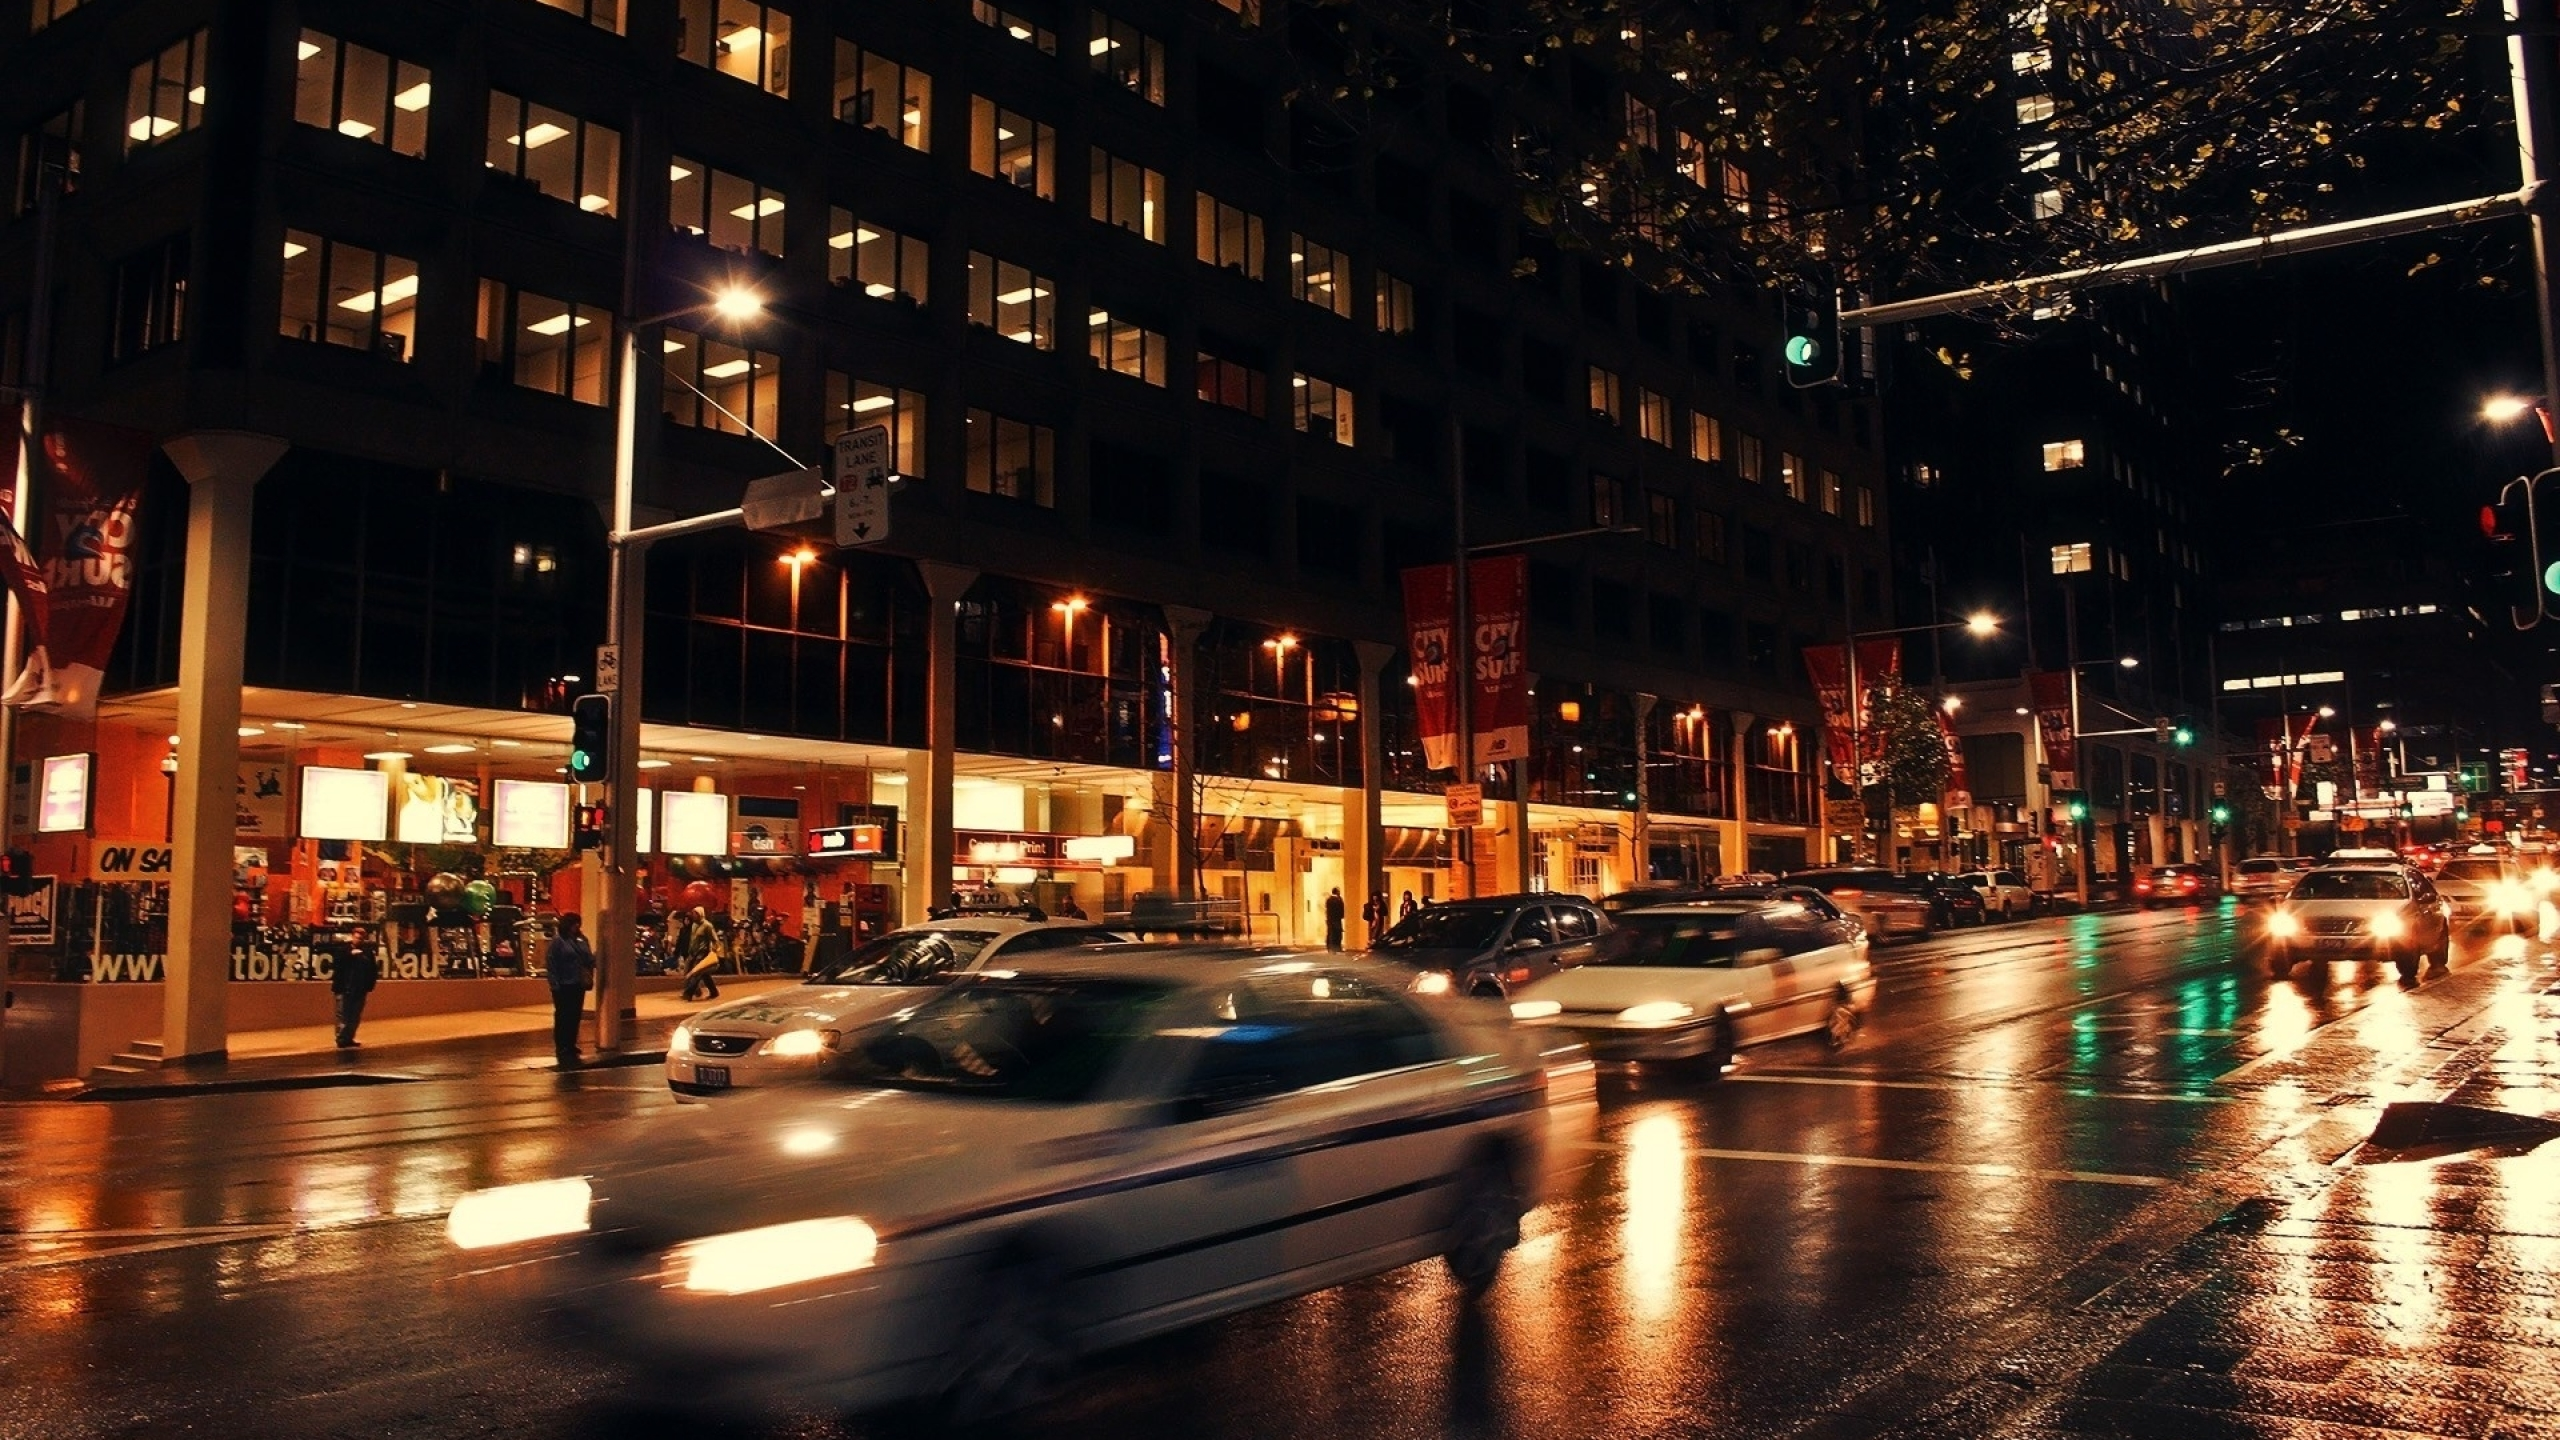 2560x1440 City Night Street 1440p Resolution Wallpaper Hd